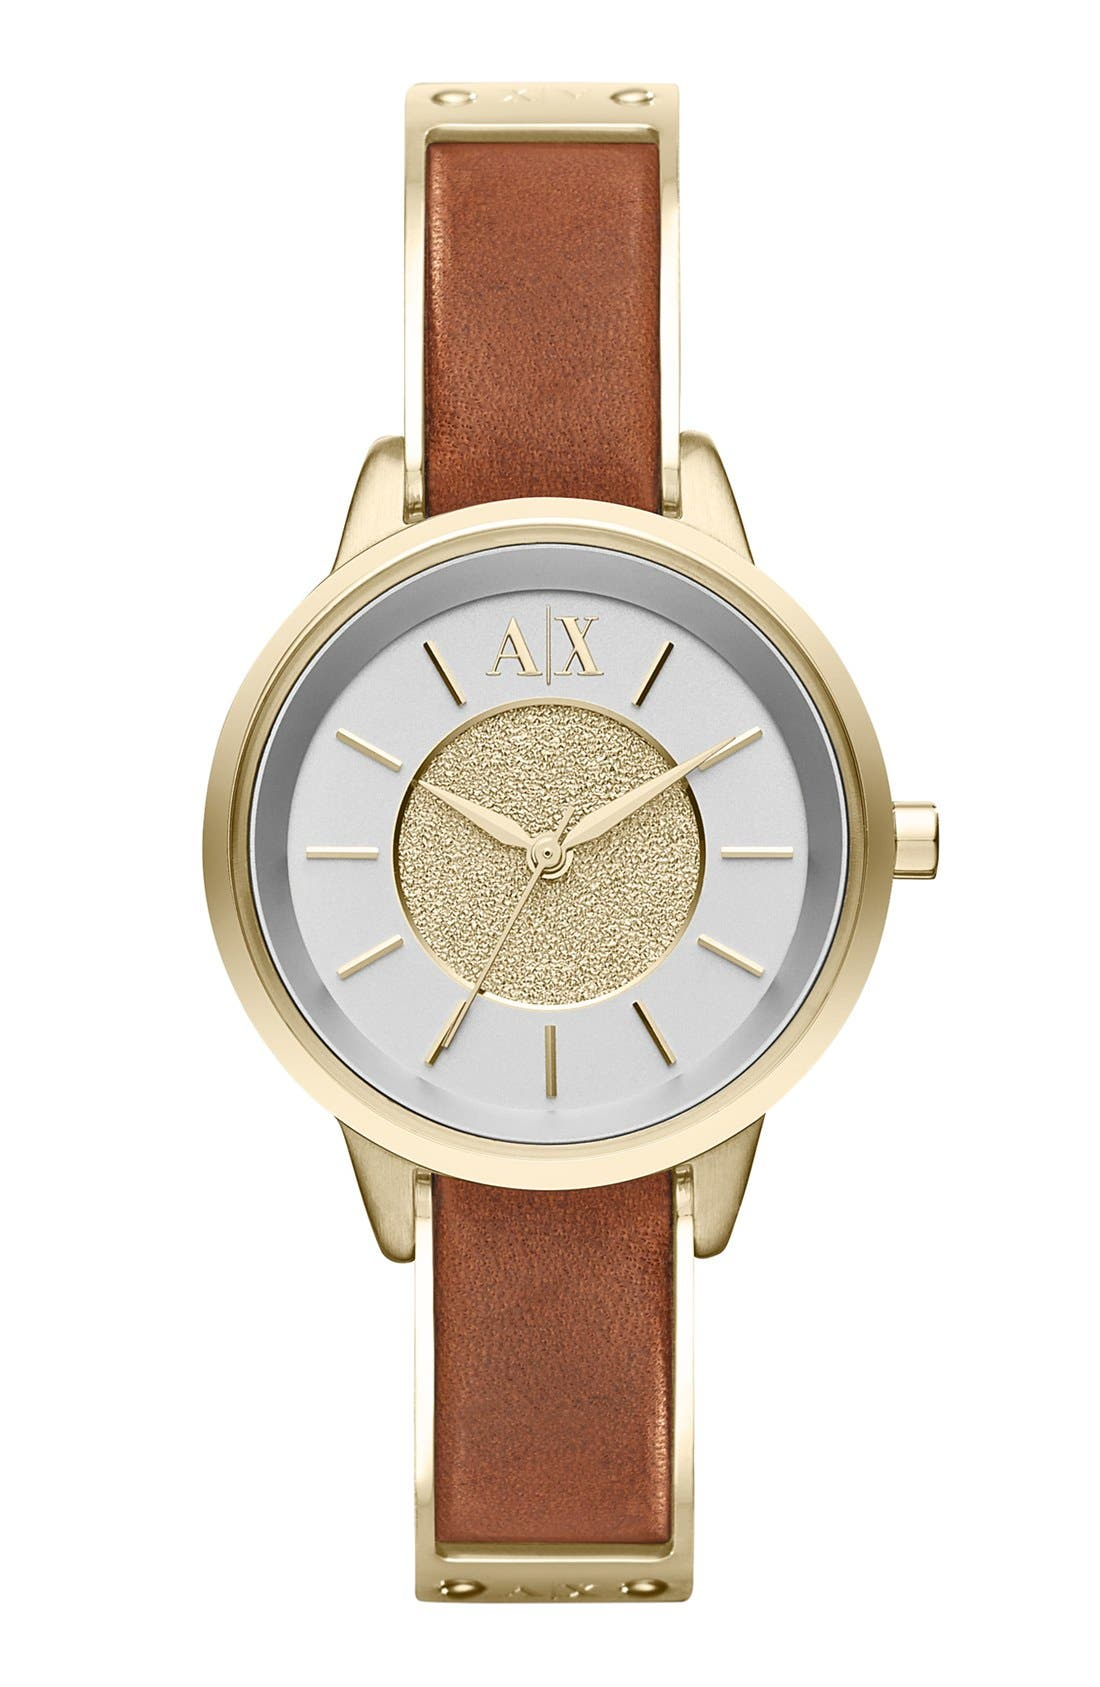 Main Image - AX Armani Exchange Round Leather Strap Watch, 30mm